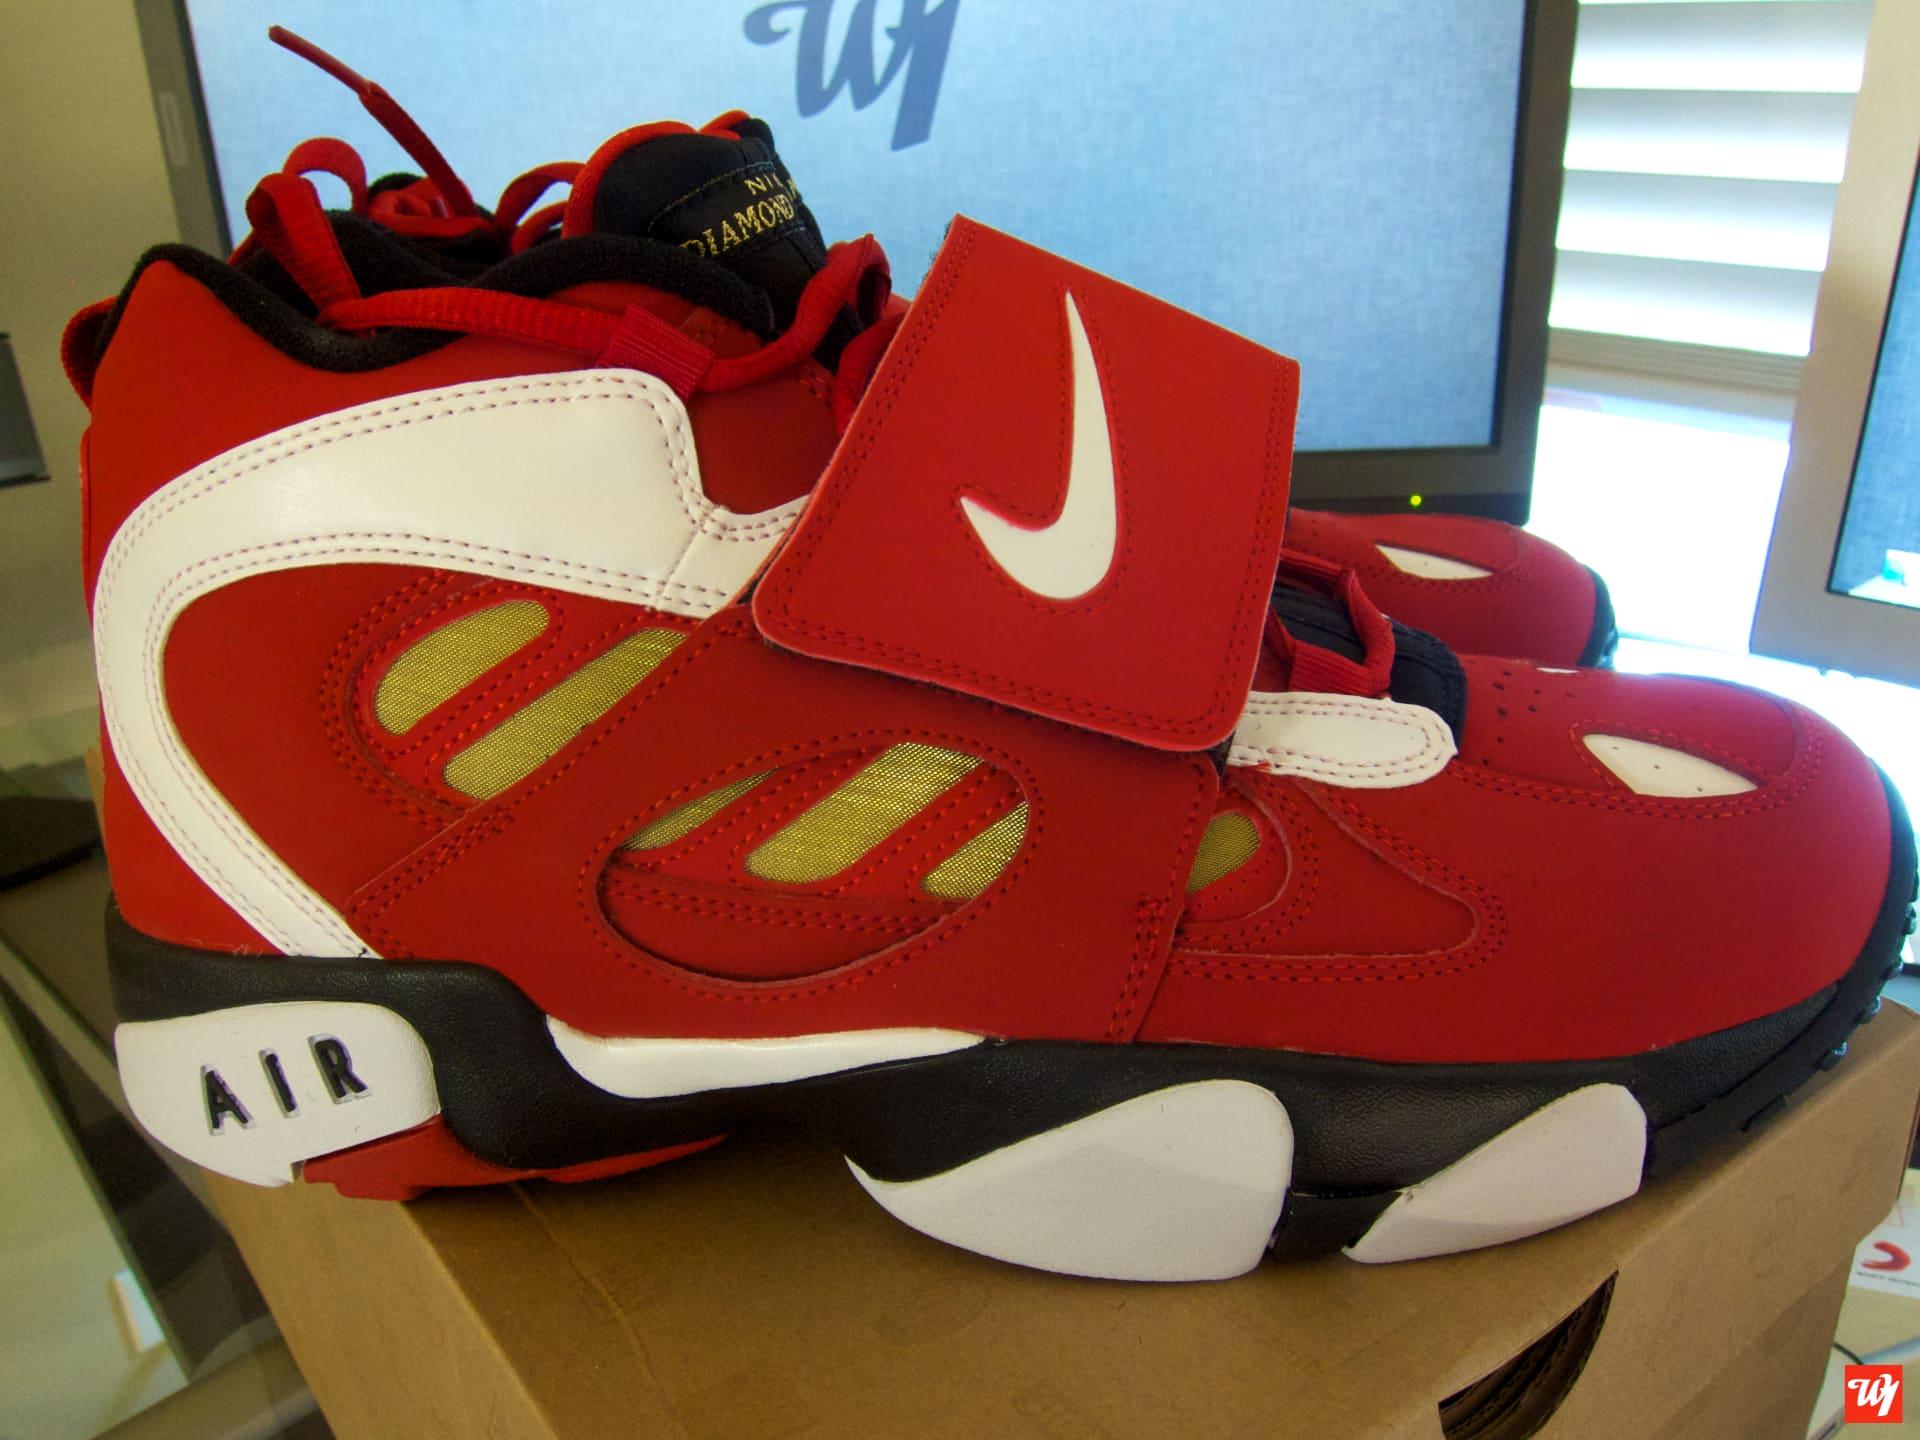 separation shoes 2b5b2 05117 nike air diamond turf 2 varsity red